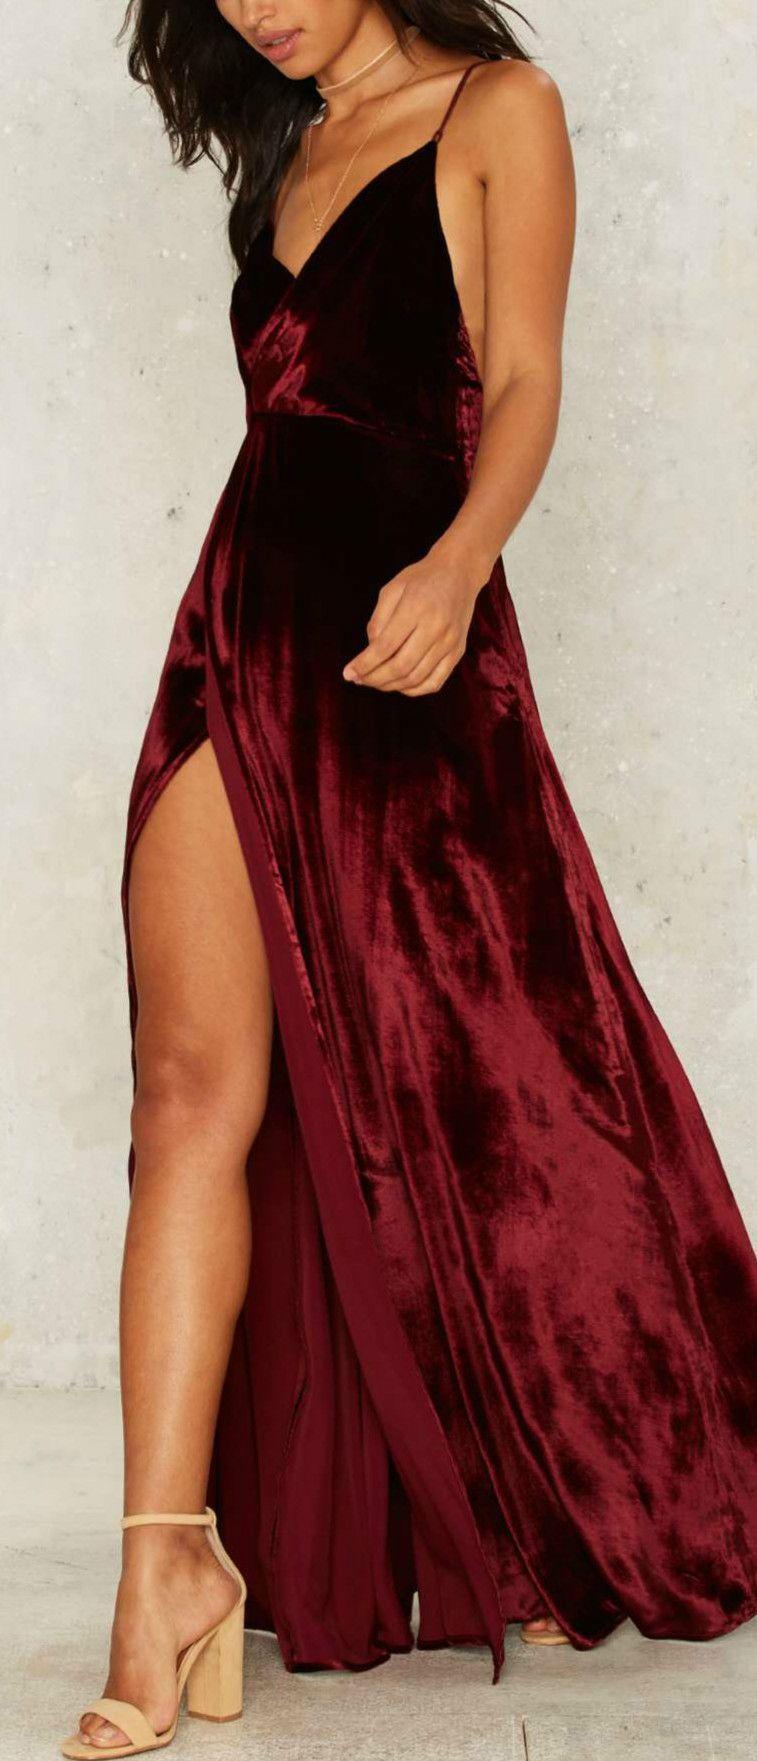 Womenus v neck backless velvet prom dress if i had style